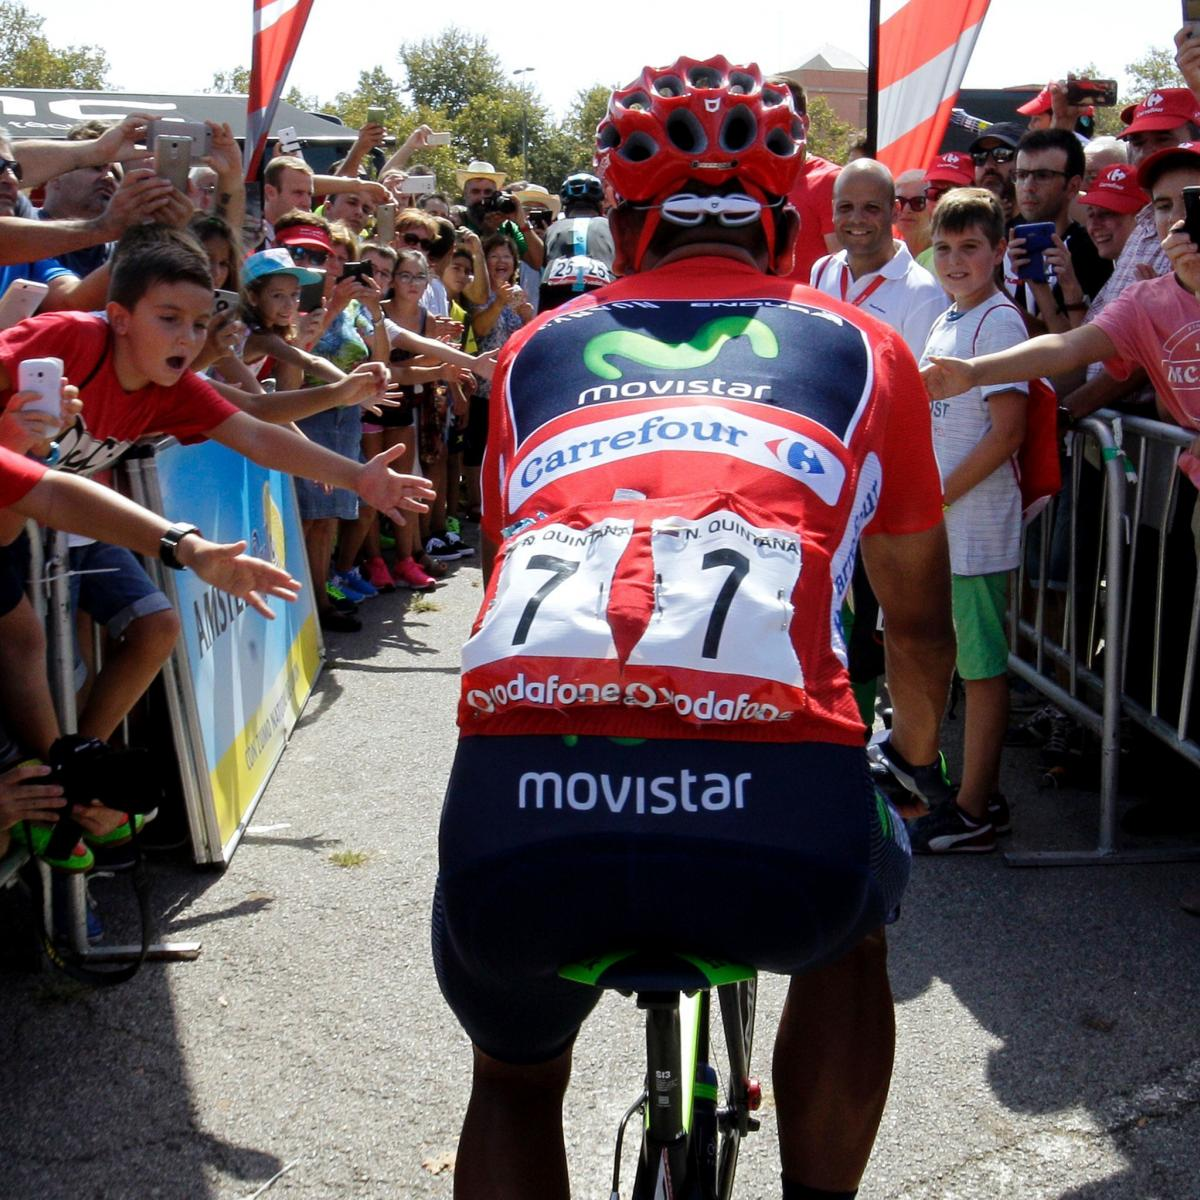 ebd8d1d91 Vuelta a Espana 2016  Stage 17 Results